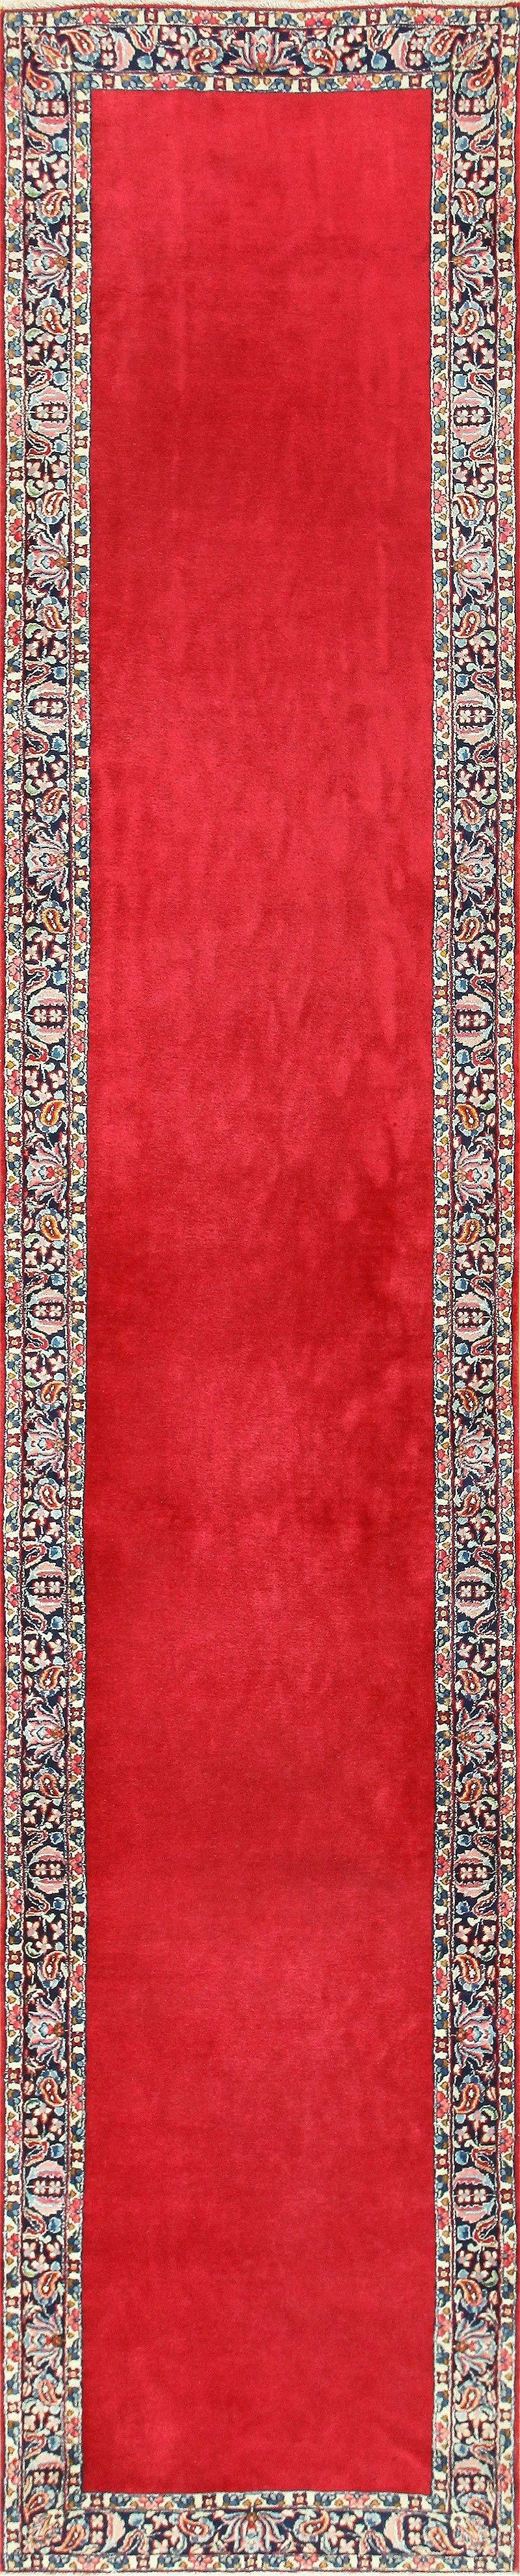 Vintage Red Color Persian Floral Kerman Runner Rug 50349 Nazmiyal Pertaining To Red Runner Rugs For Hallway (#20 of 20)